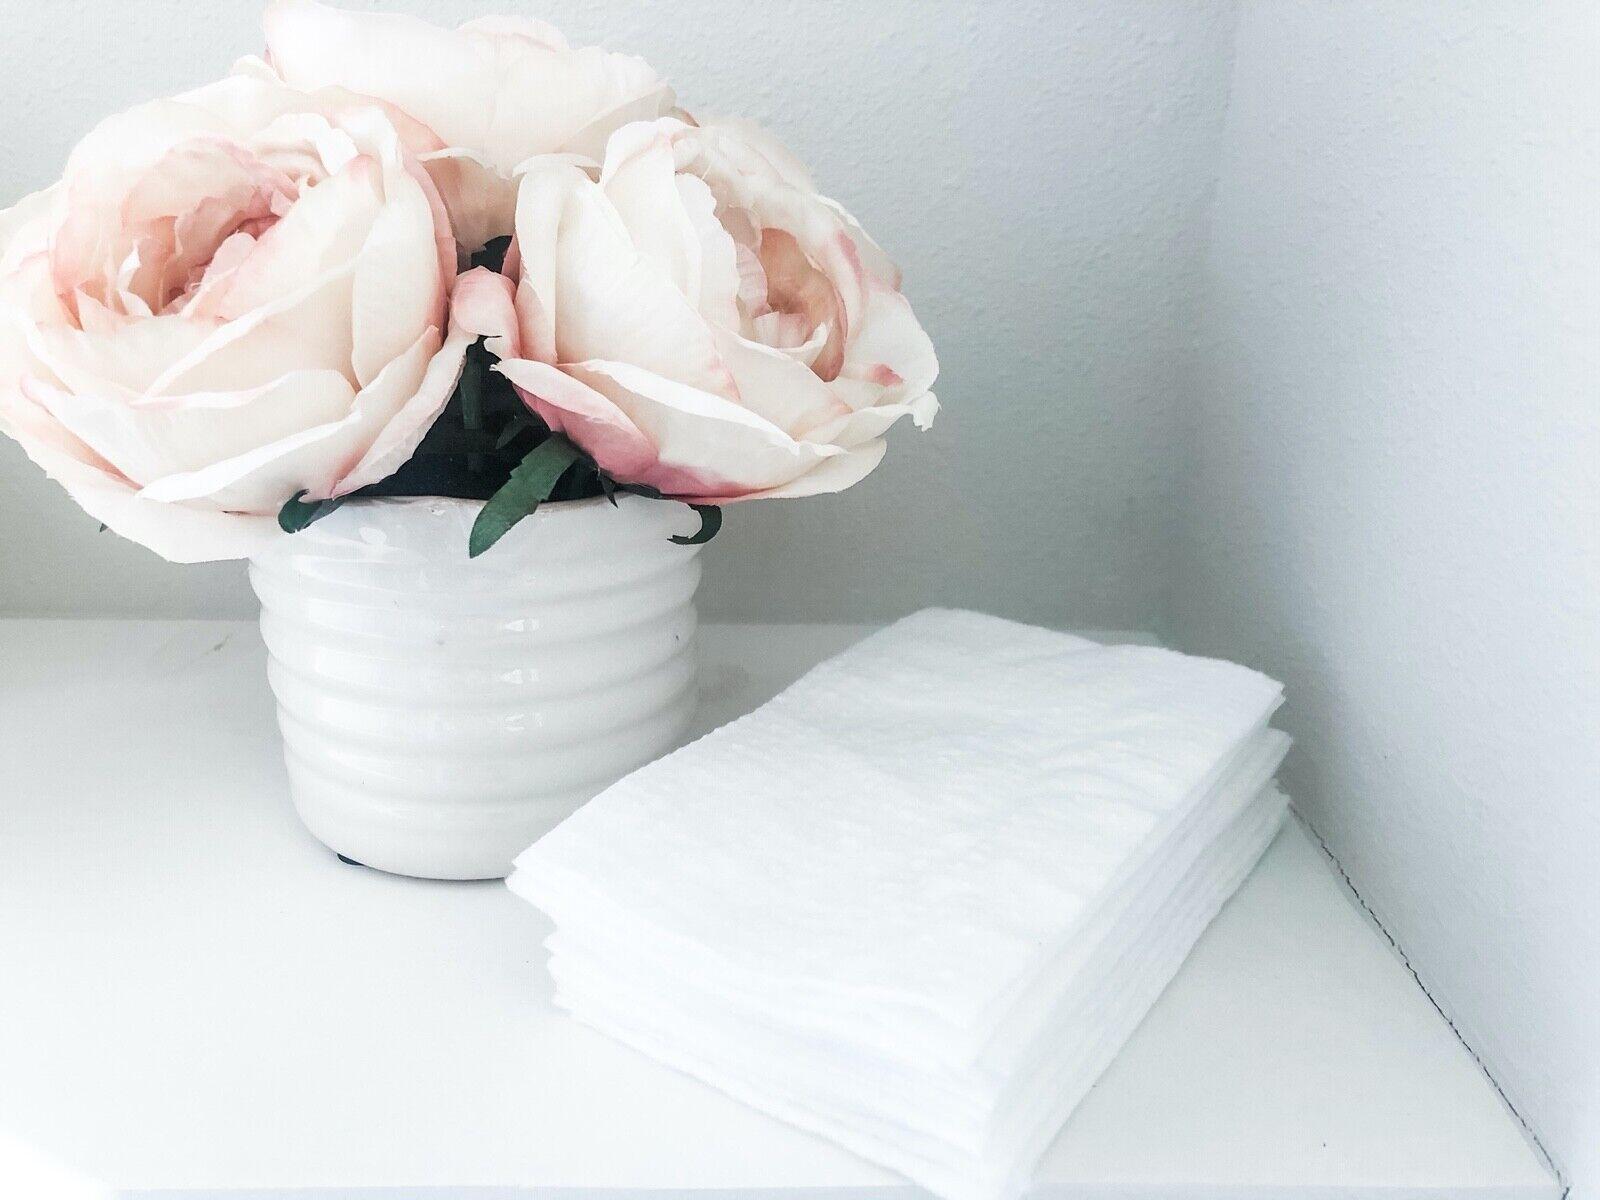 Reusable Washable Toilet Paper 16 Sheets - Zero Waste, Eco F